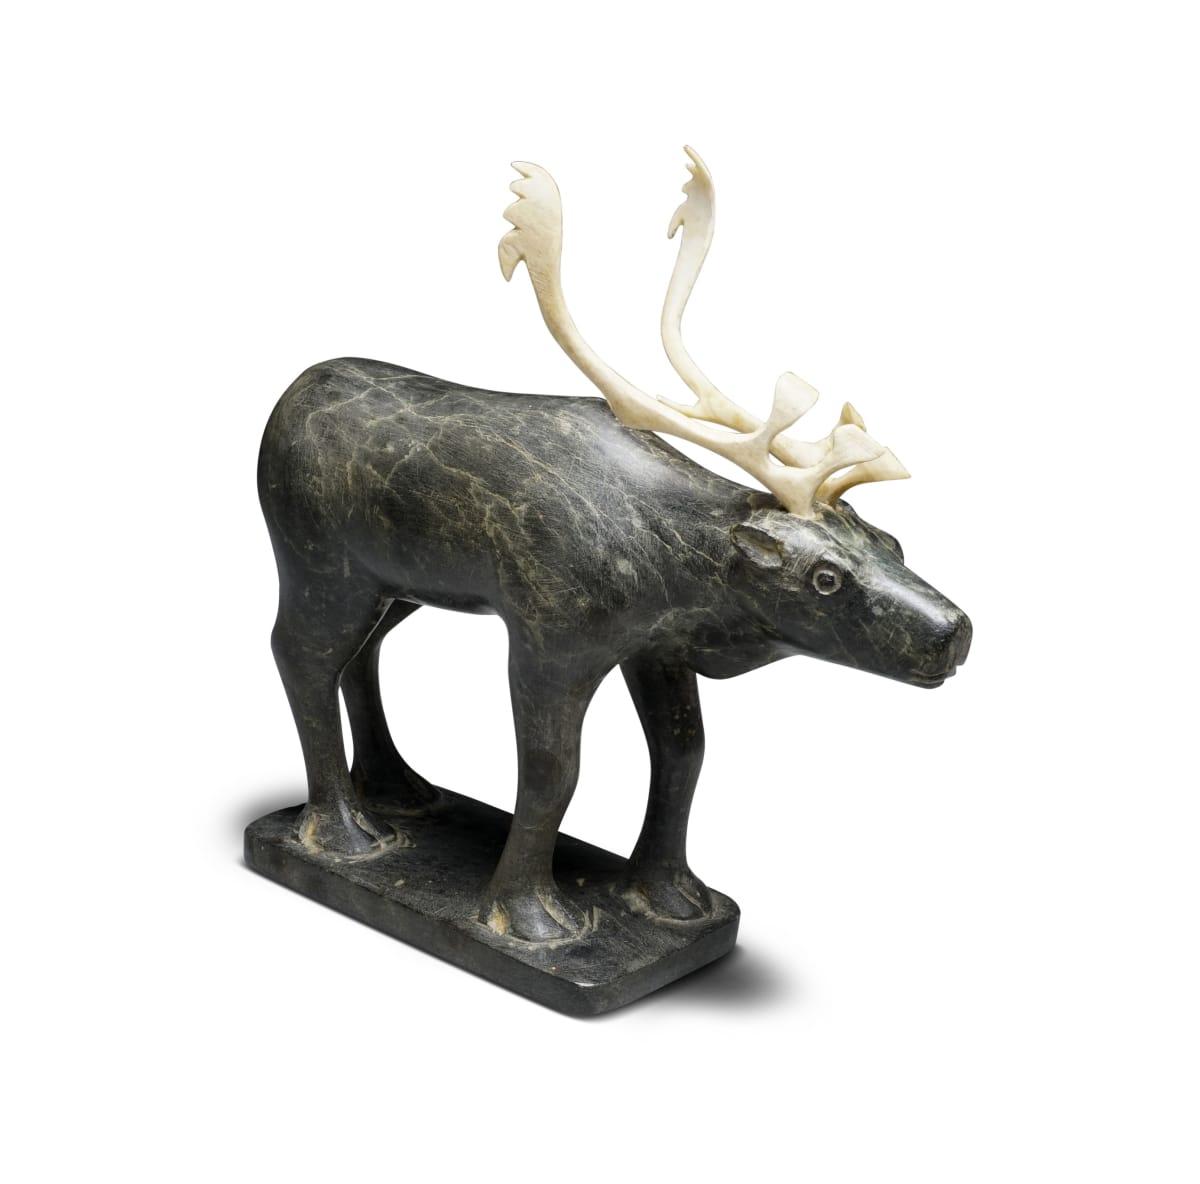 LOT 54 JOANASI KAYAKJUAK (1917-1994) SANIRAJAK (HALL BEACH) Standing Caribou, early 1960s stone and ivory, 5 1/2 x 8 x 2 1/2 in (14 x 20.3 x 6.3 cm) ESTIMATE: $600 — $900